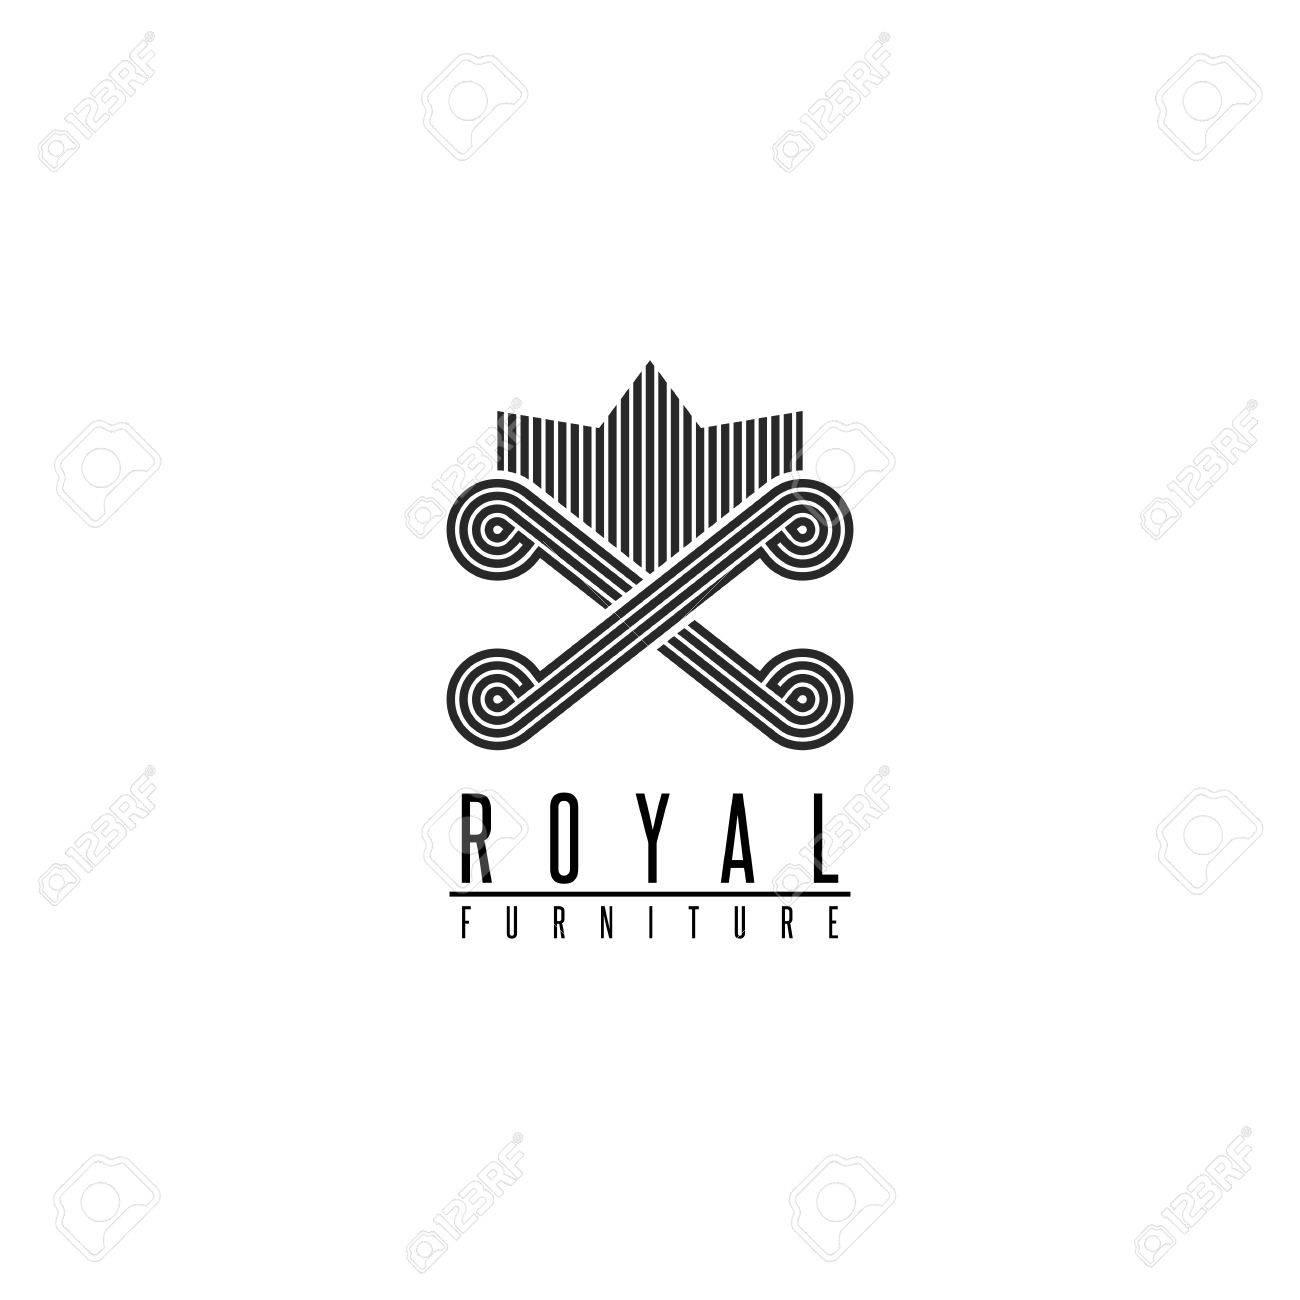 Furniture Logo Chair Monogram Form Throne, Back Sofa Crown Shape,  Comfortable Interior Icon Stock